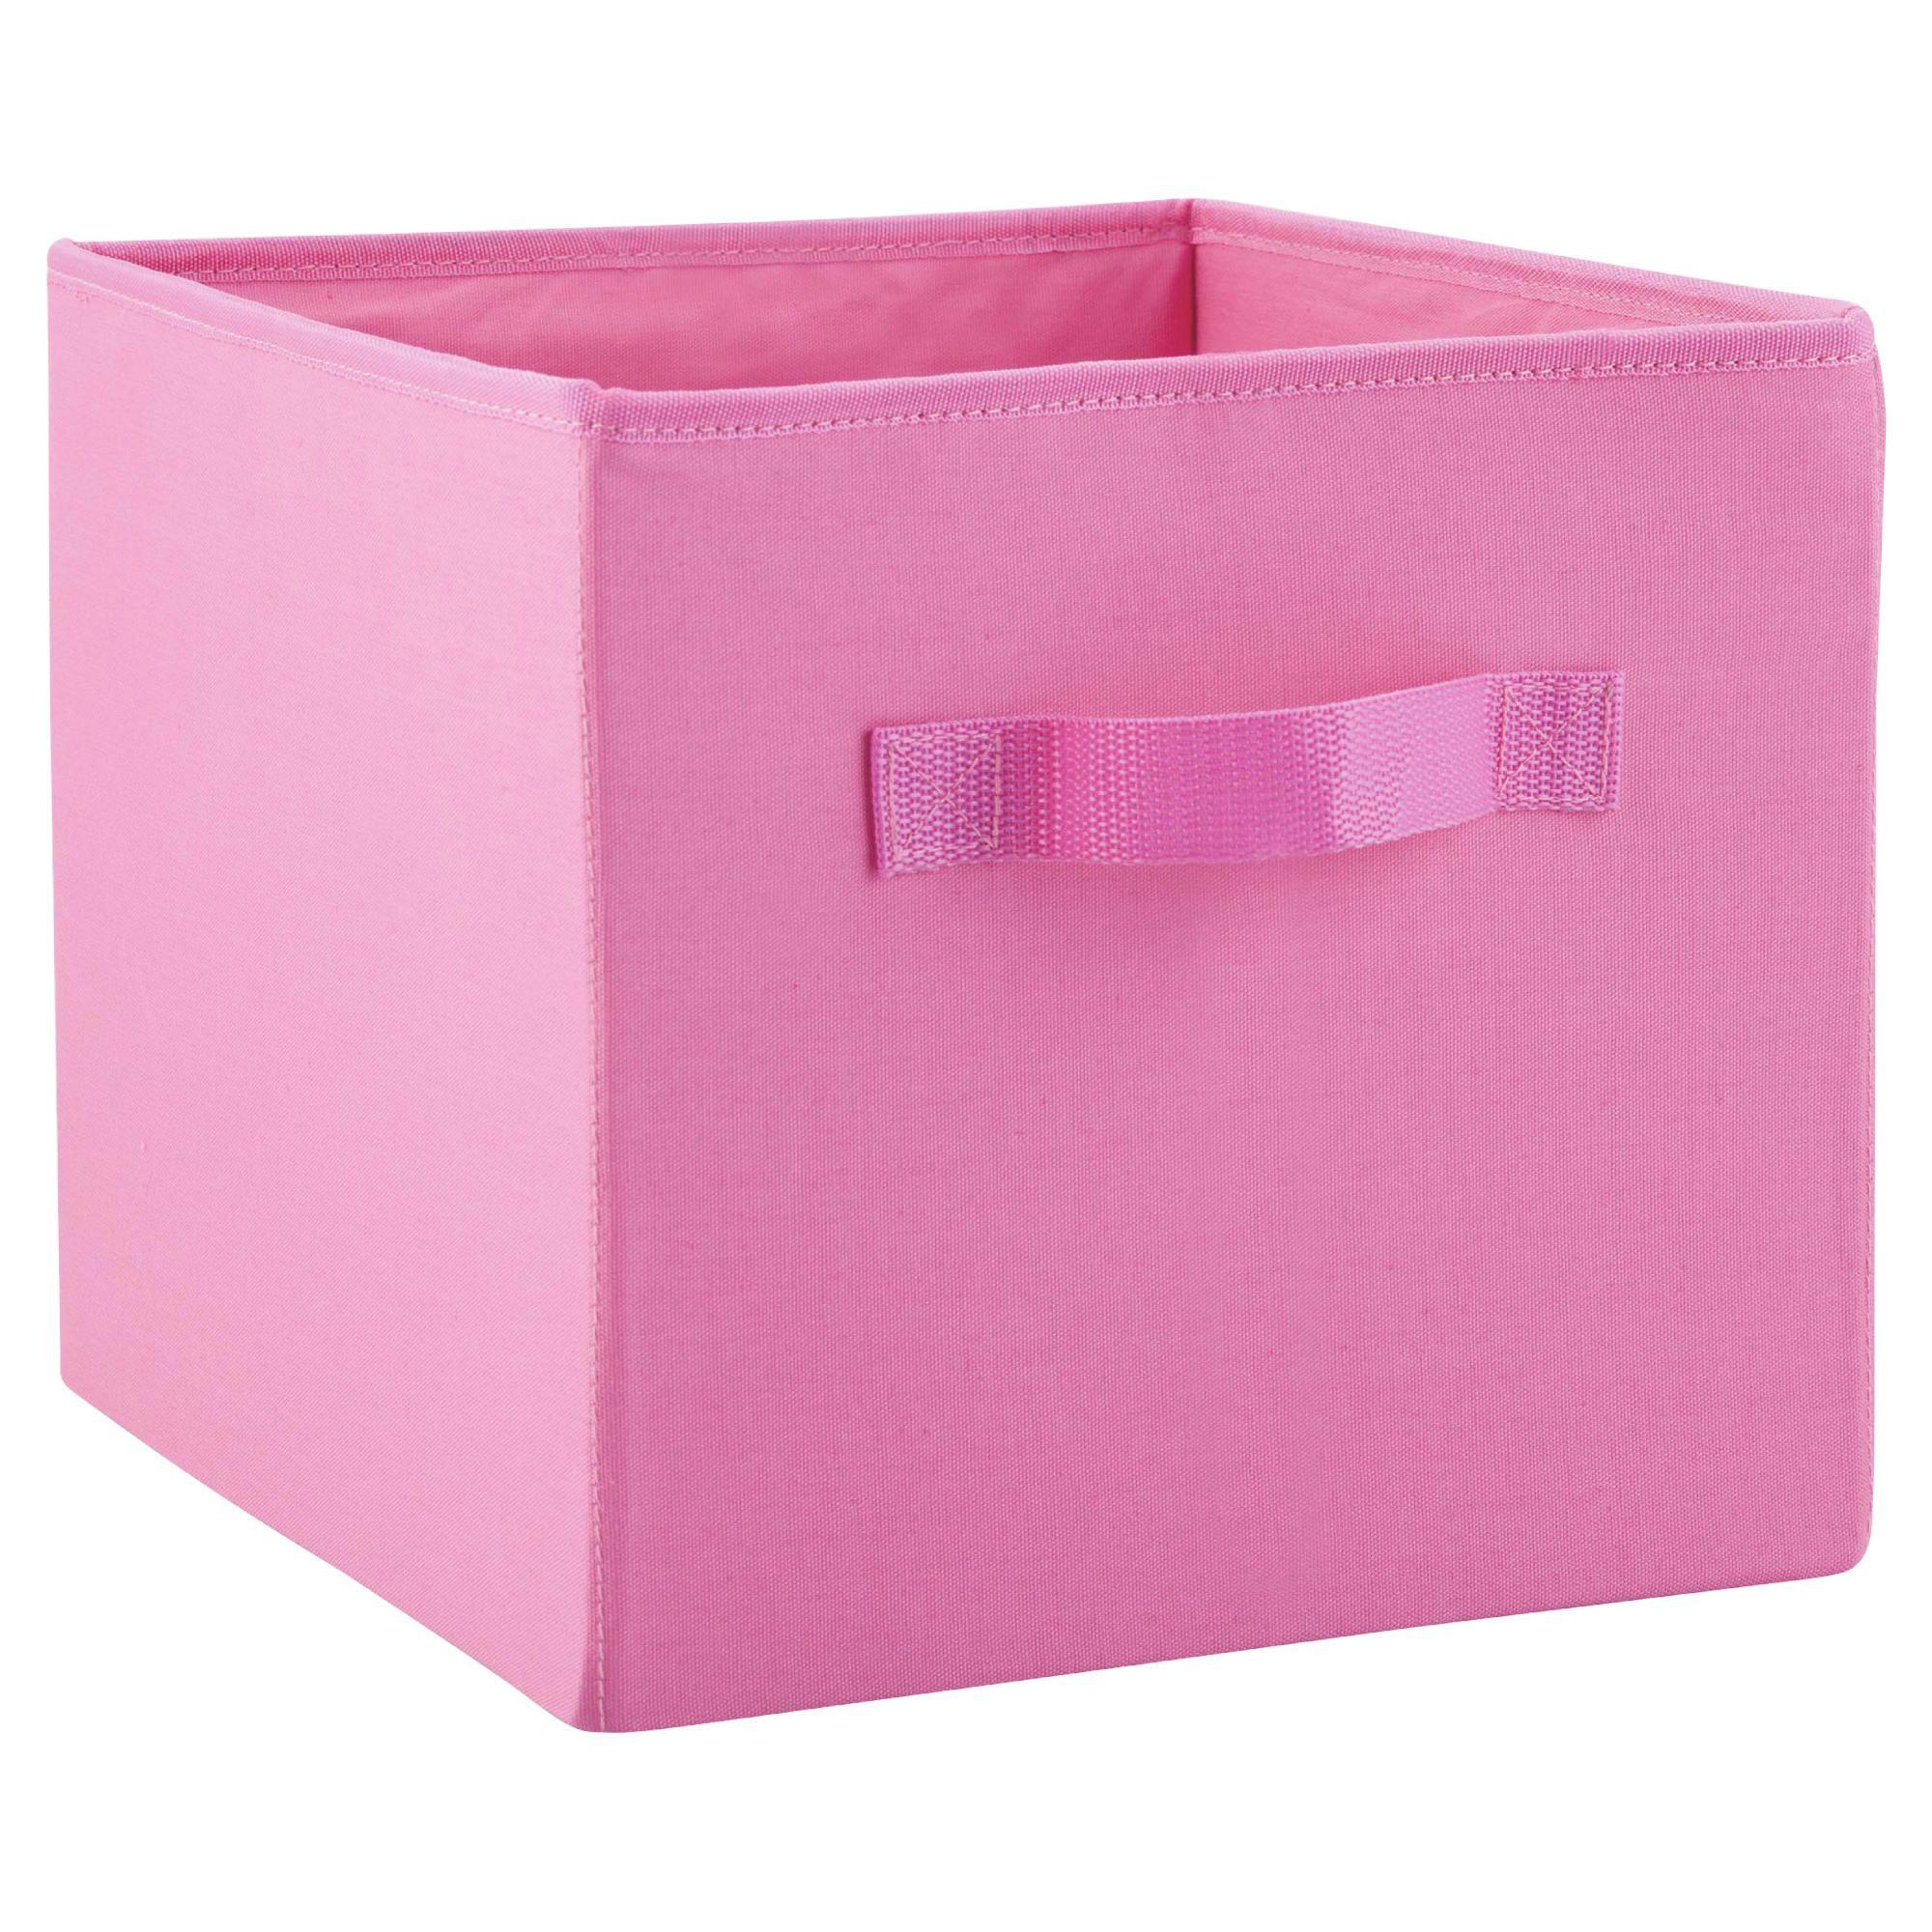 Kids pink storage box